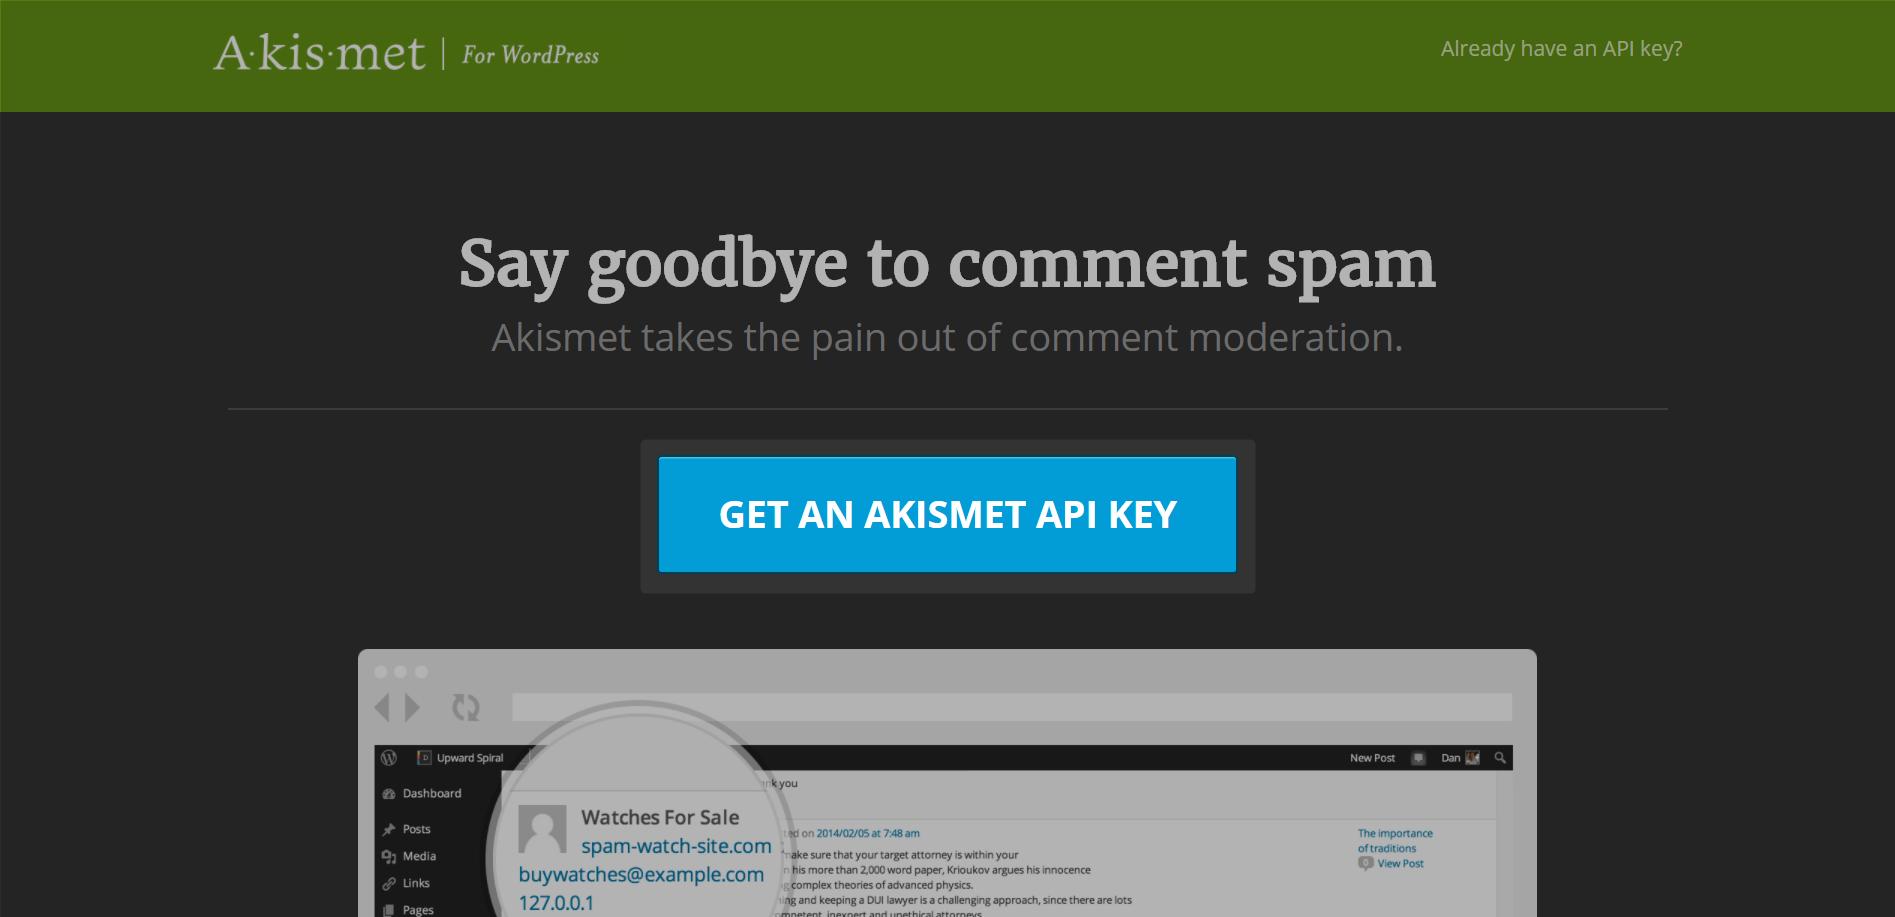 GET_AN_AKISMET_API_KEY